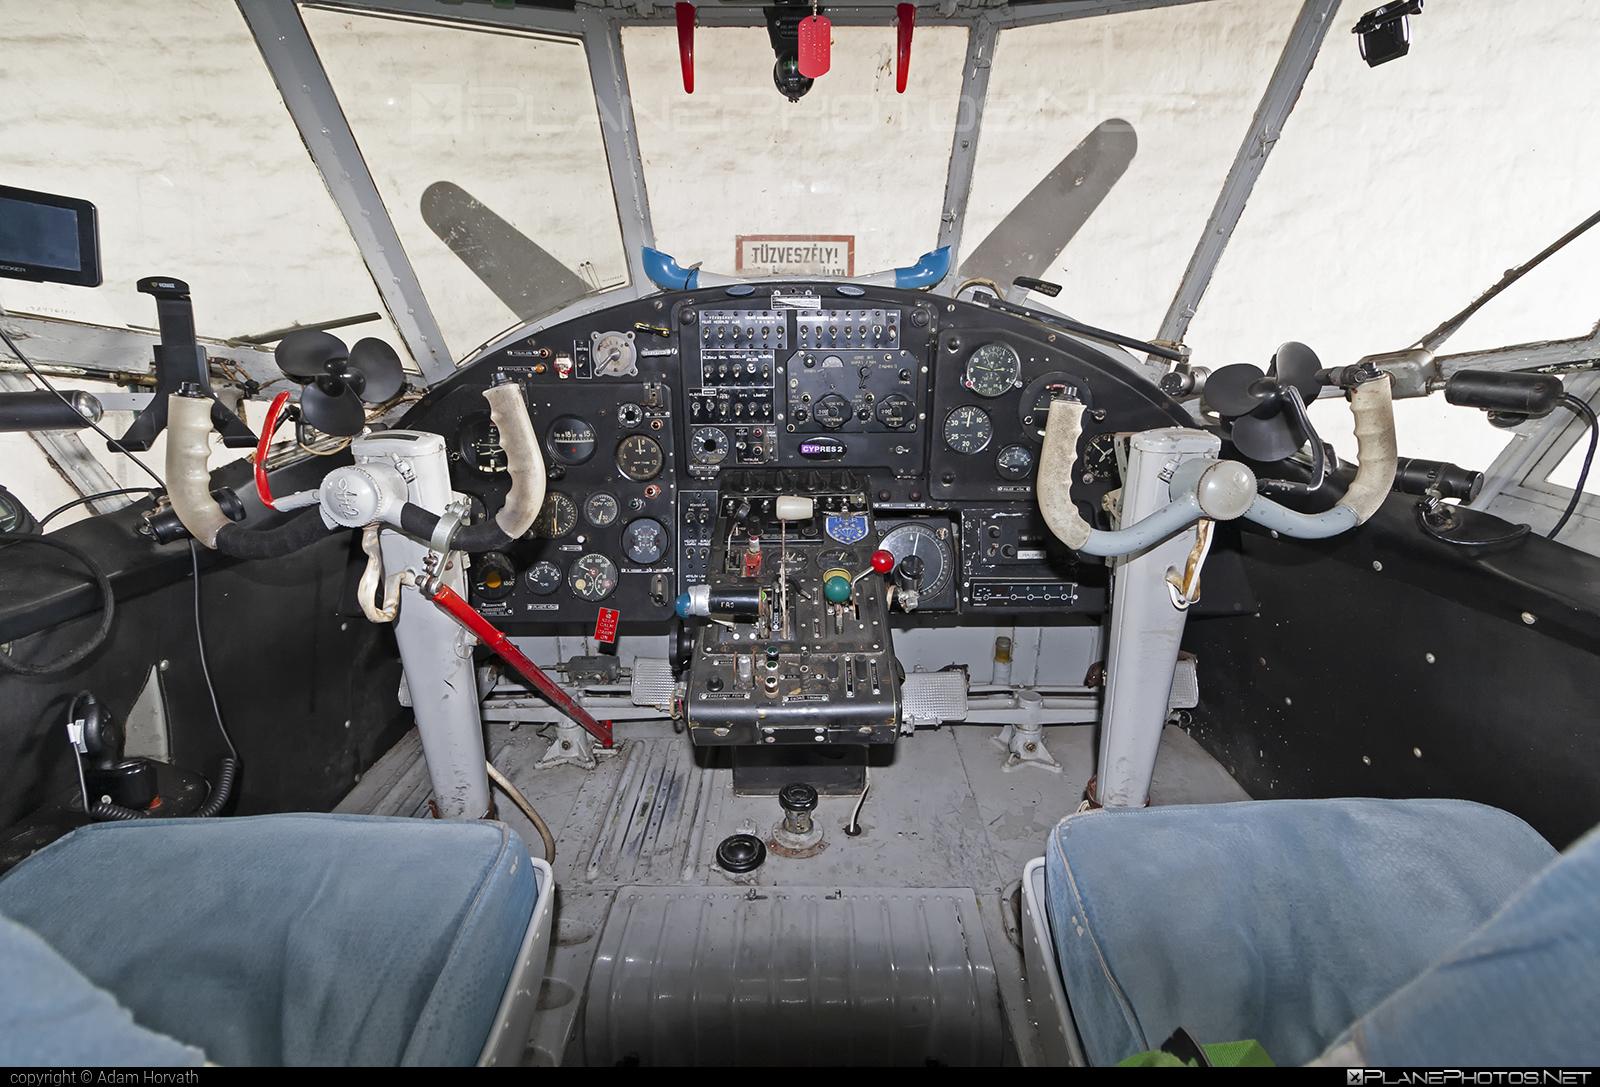 PZL-Mielec An-2R - HA-MEA operated by Sky Escort Hungary Aero Club #an2 #an2r #antonov2 #pzl #pzlmielec #skyescorthungaryaeroclub